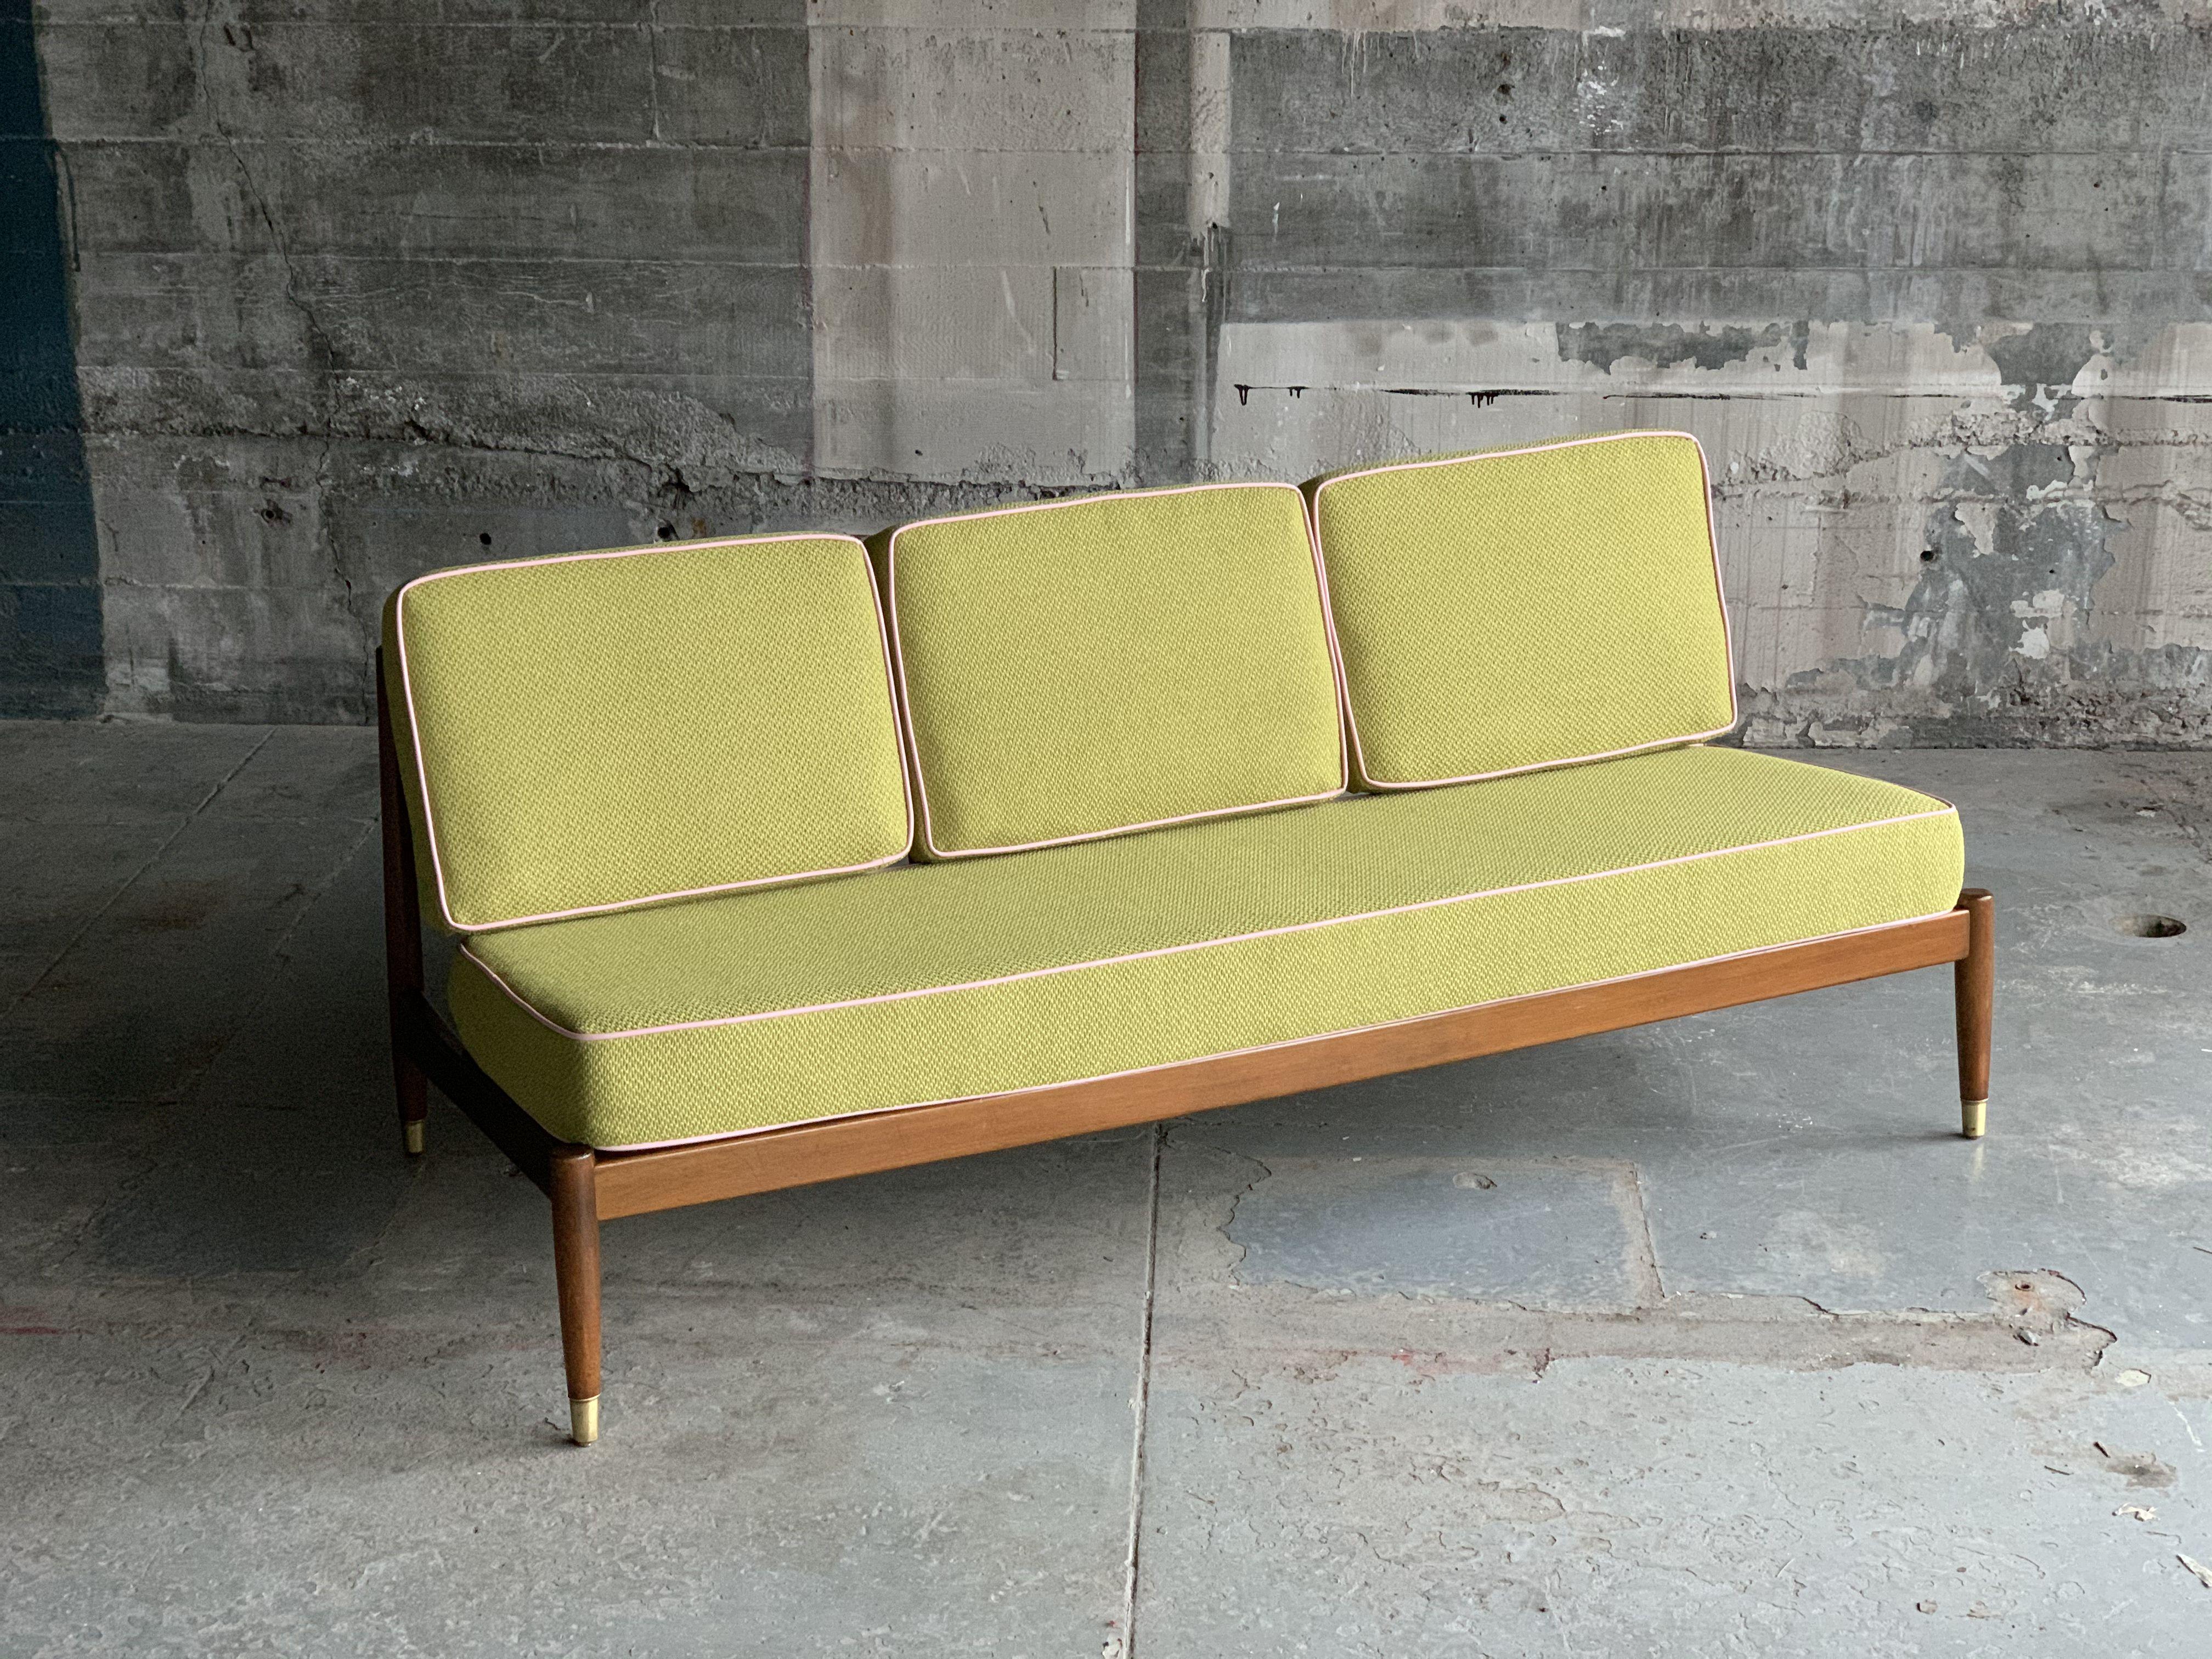 Dux Swedish Mid Century Armless Sofa In 2020 Mid Century Danish Furniture Armless Sofa Mid Century Sofa